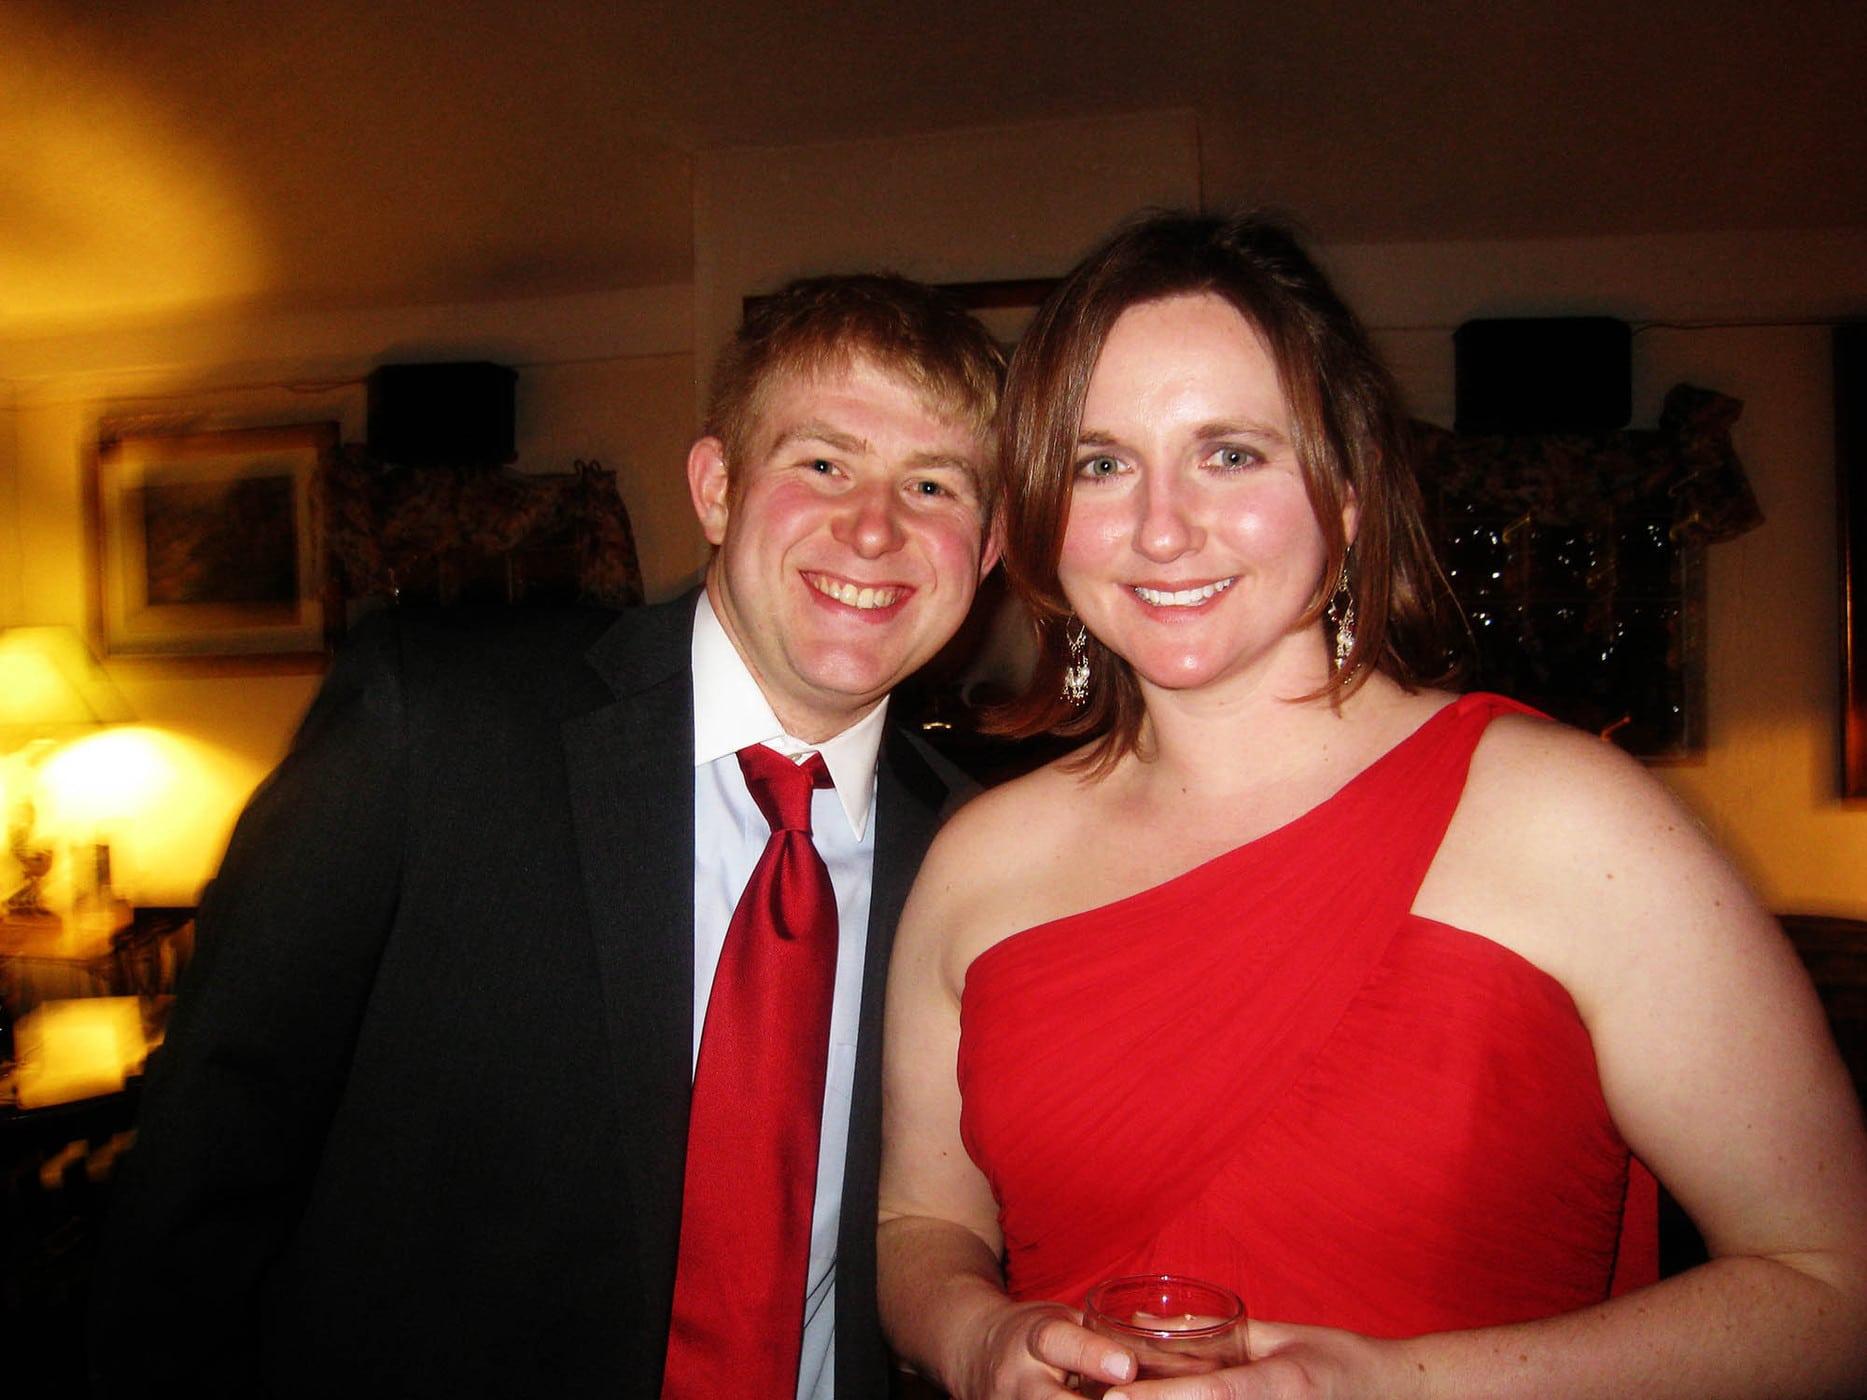 Josh and Jennifer's Wedding Reception at Irish Times in Brookfield, Illinois